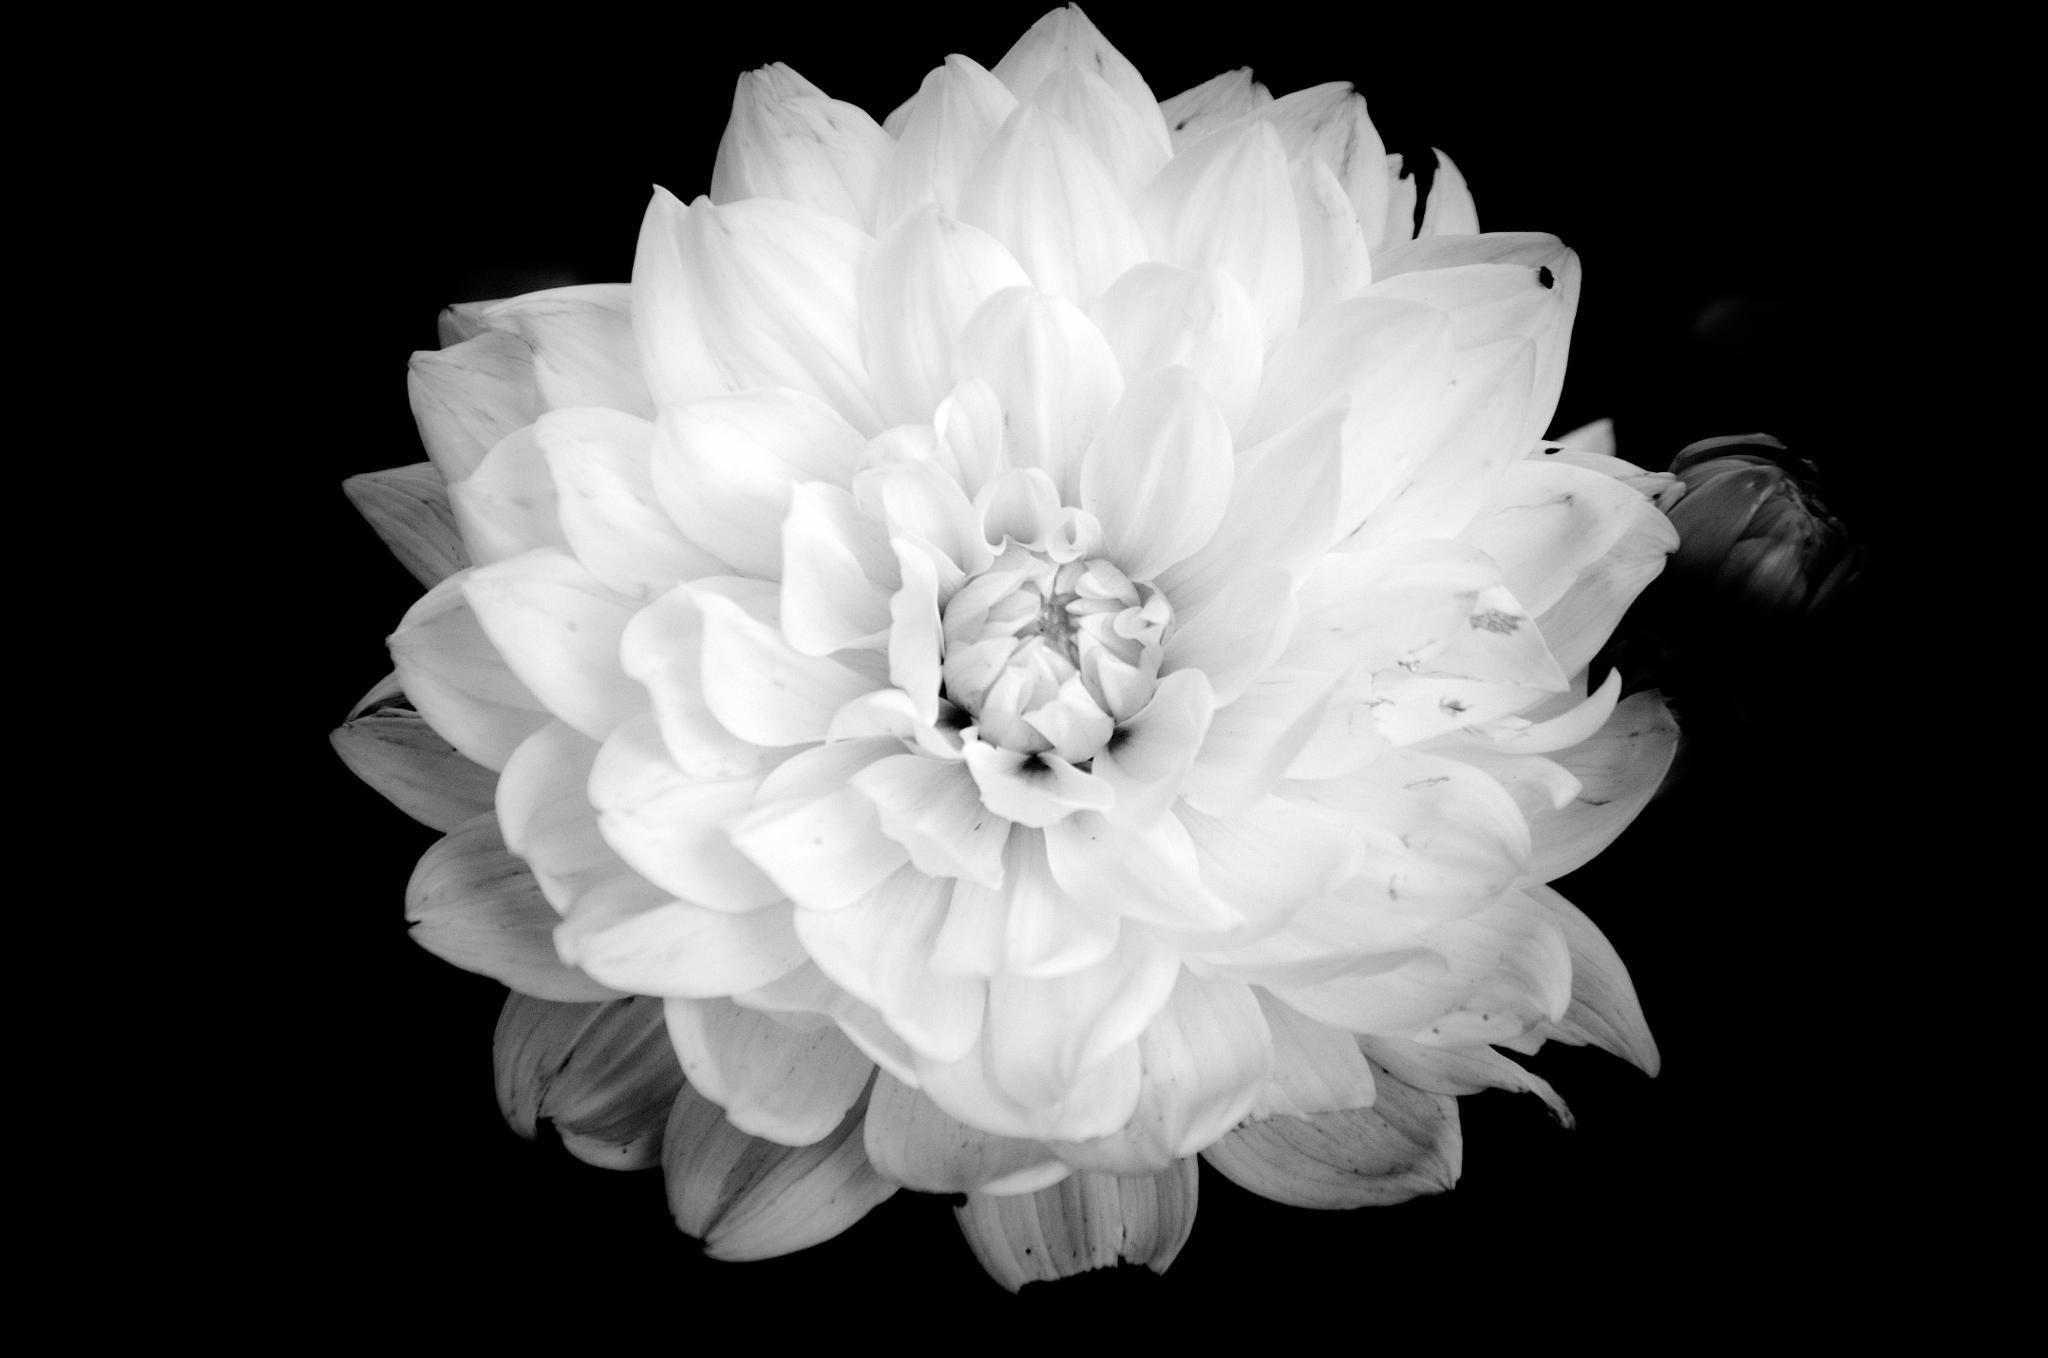 Power Flower No3 by Selman Adzomerovic